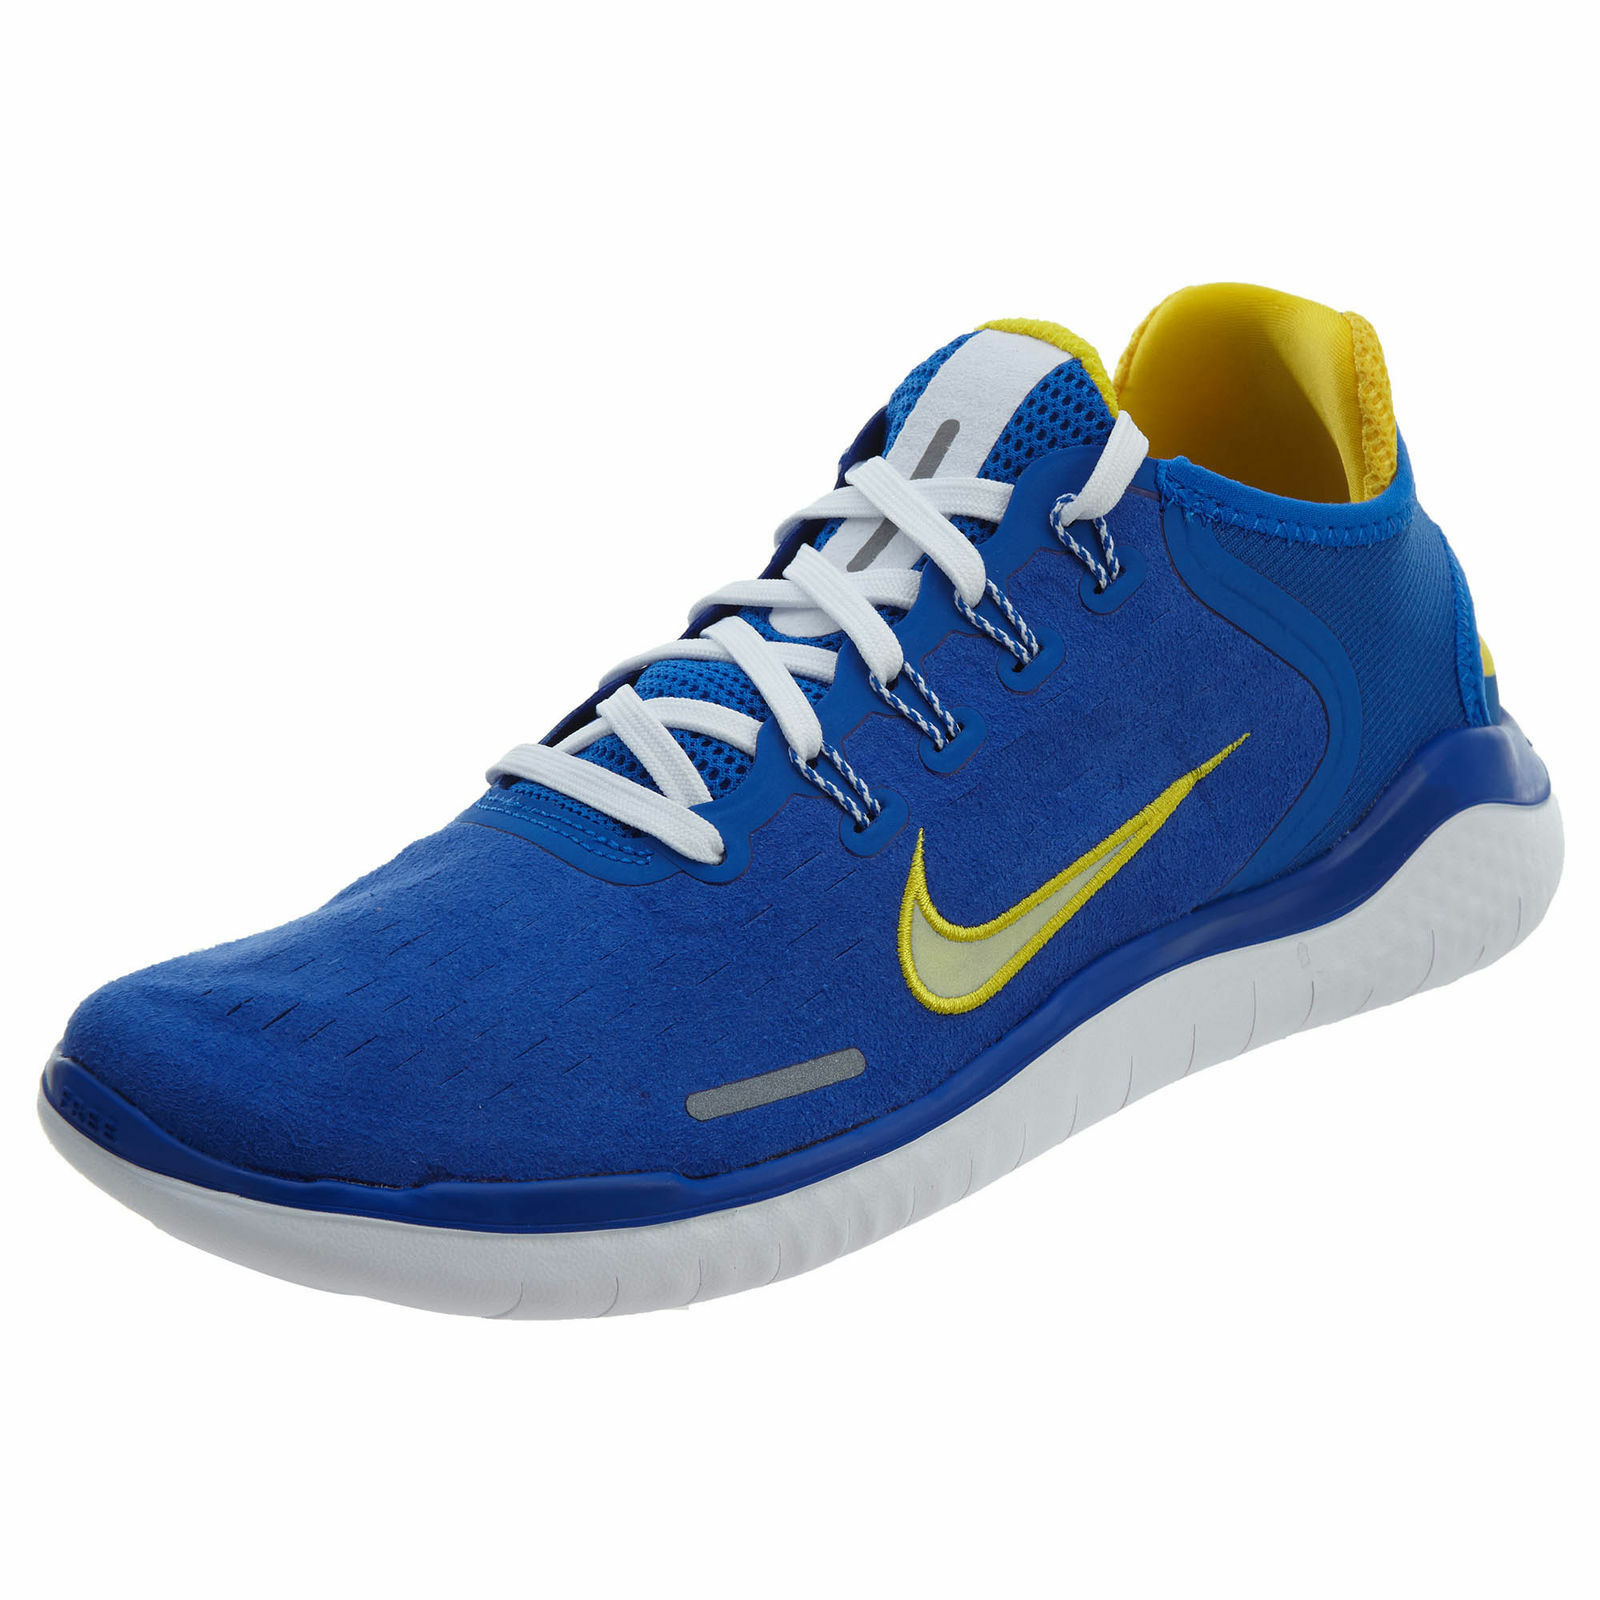 Nike Free Rn 2018 DNA Men's Running shoes Hyper Cobalt Citron Tint AH7870 400